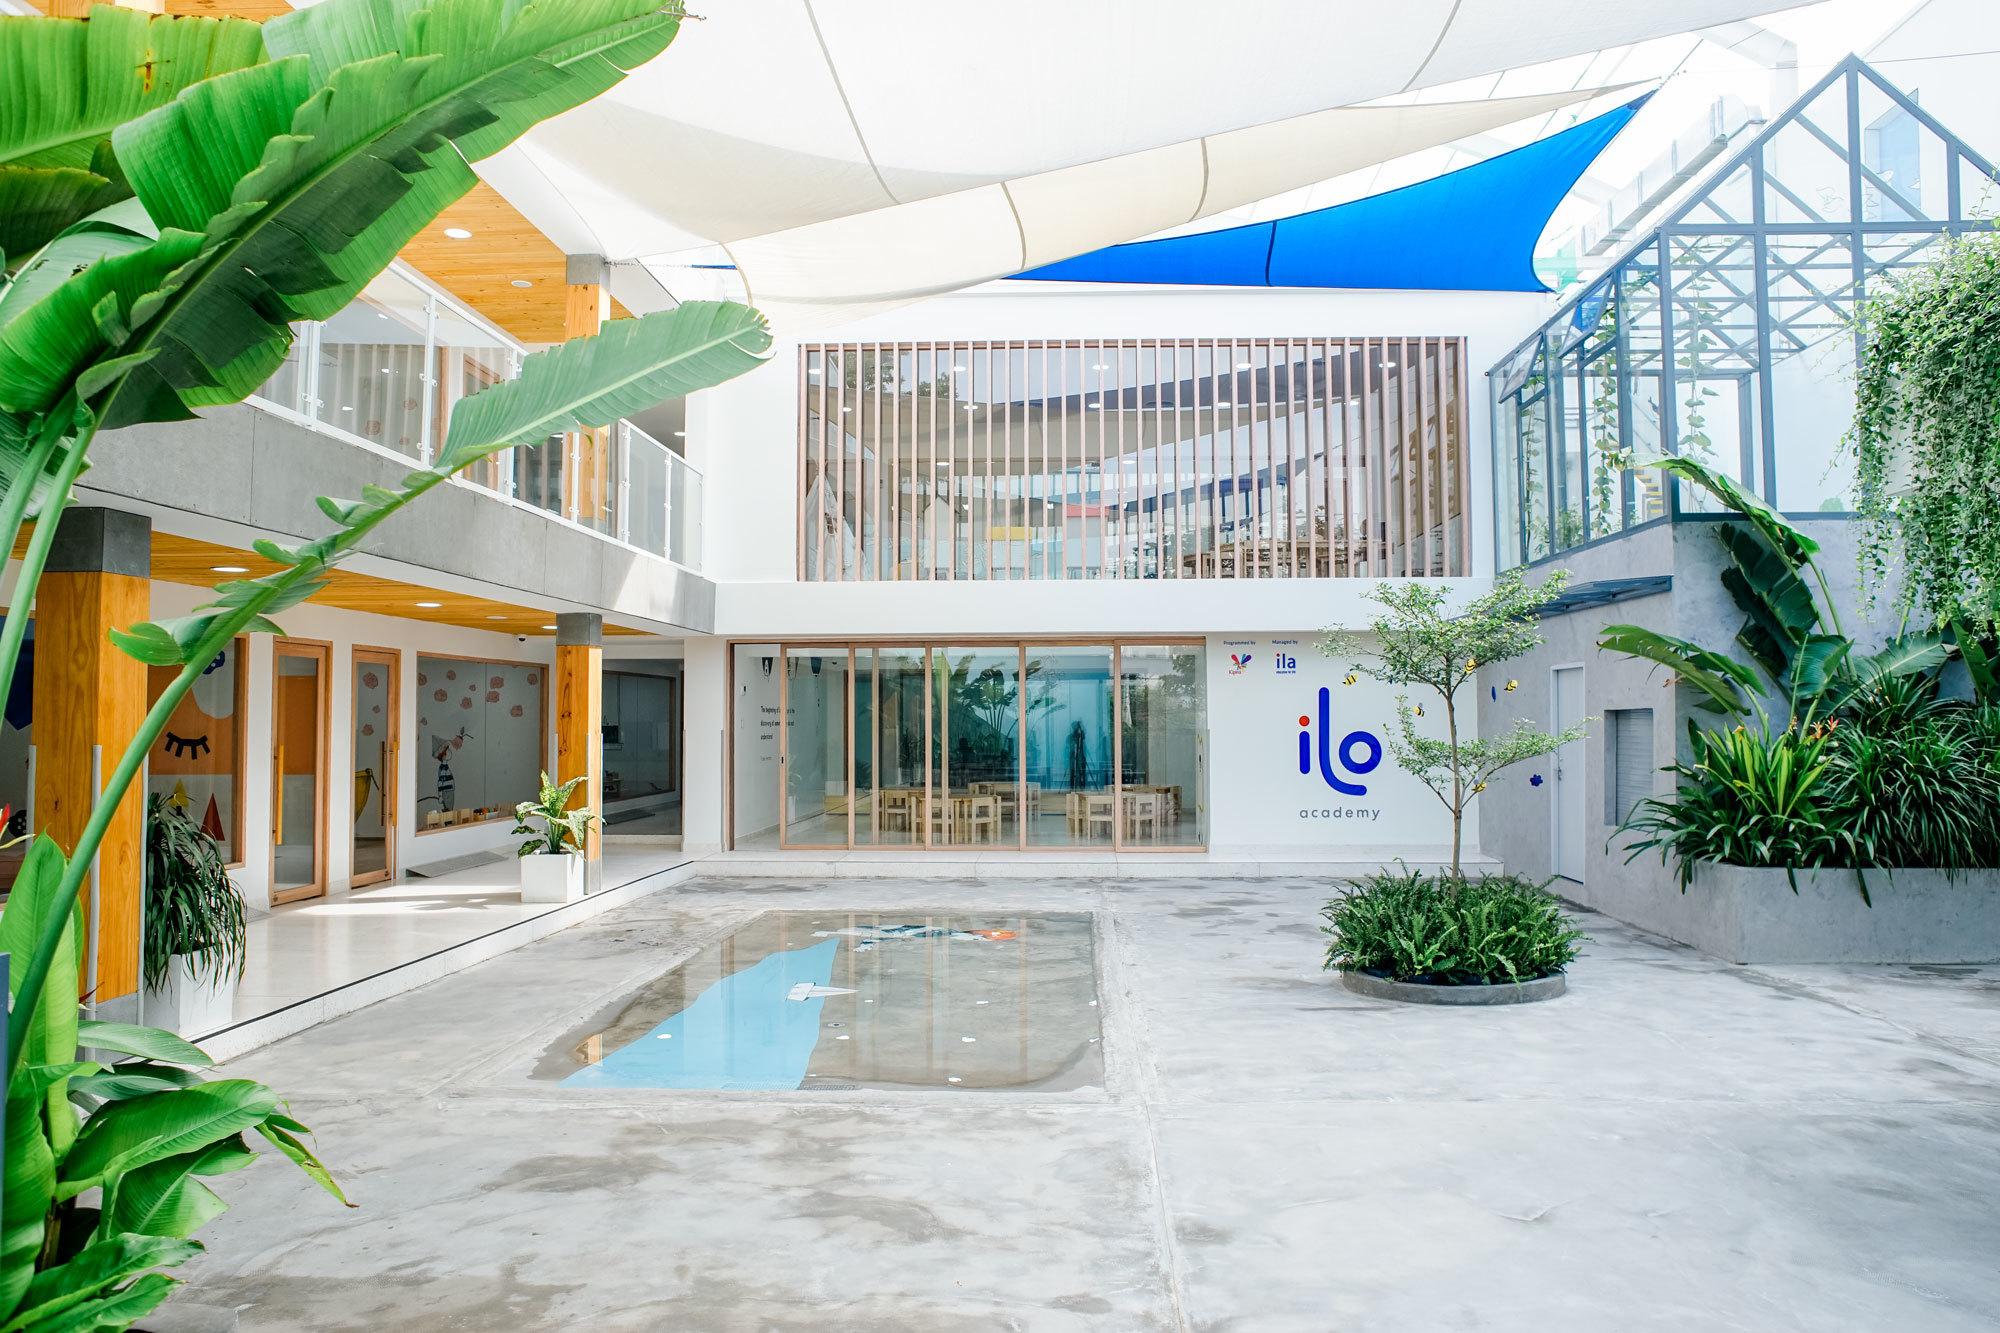 ILA ra mắt trường mầm non song ngữ ILO Academy